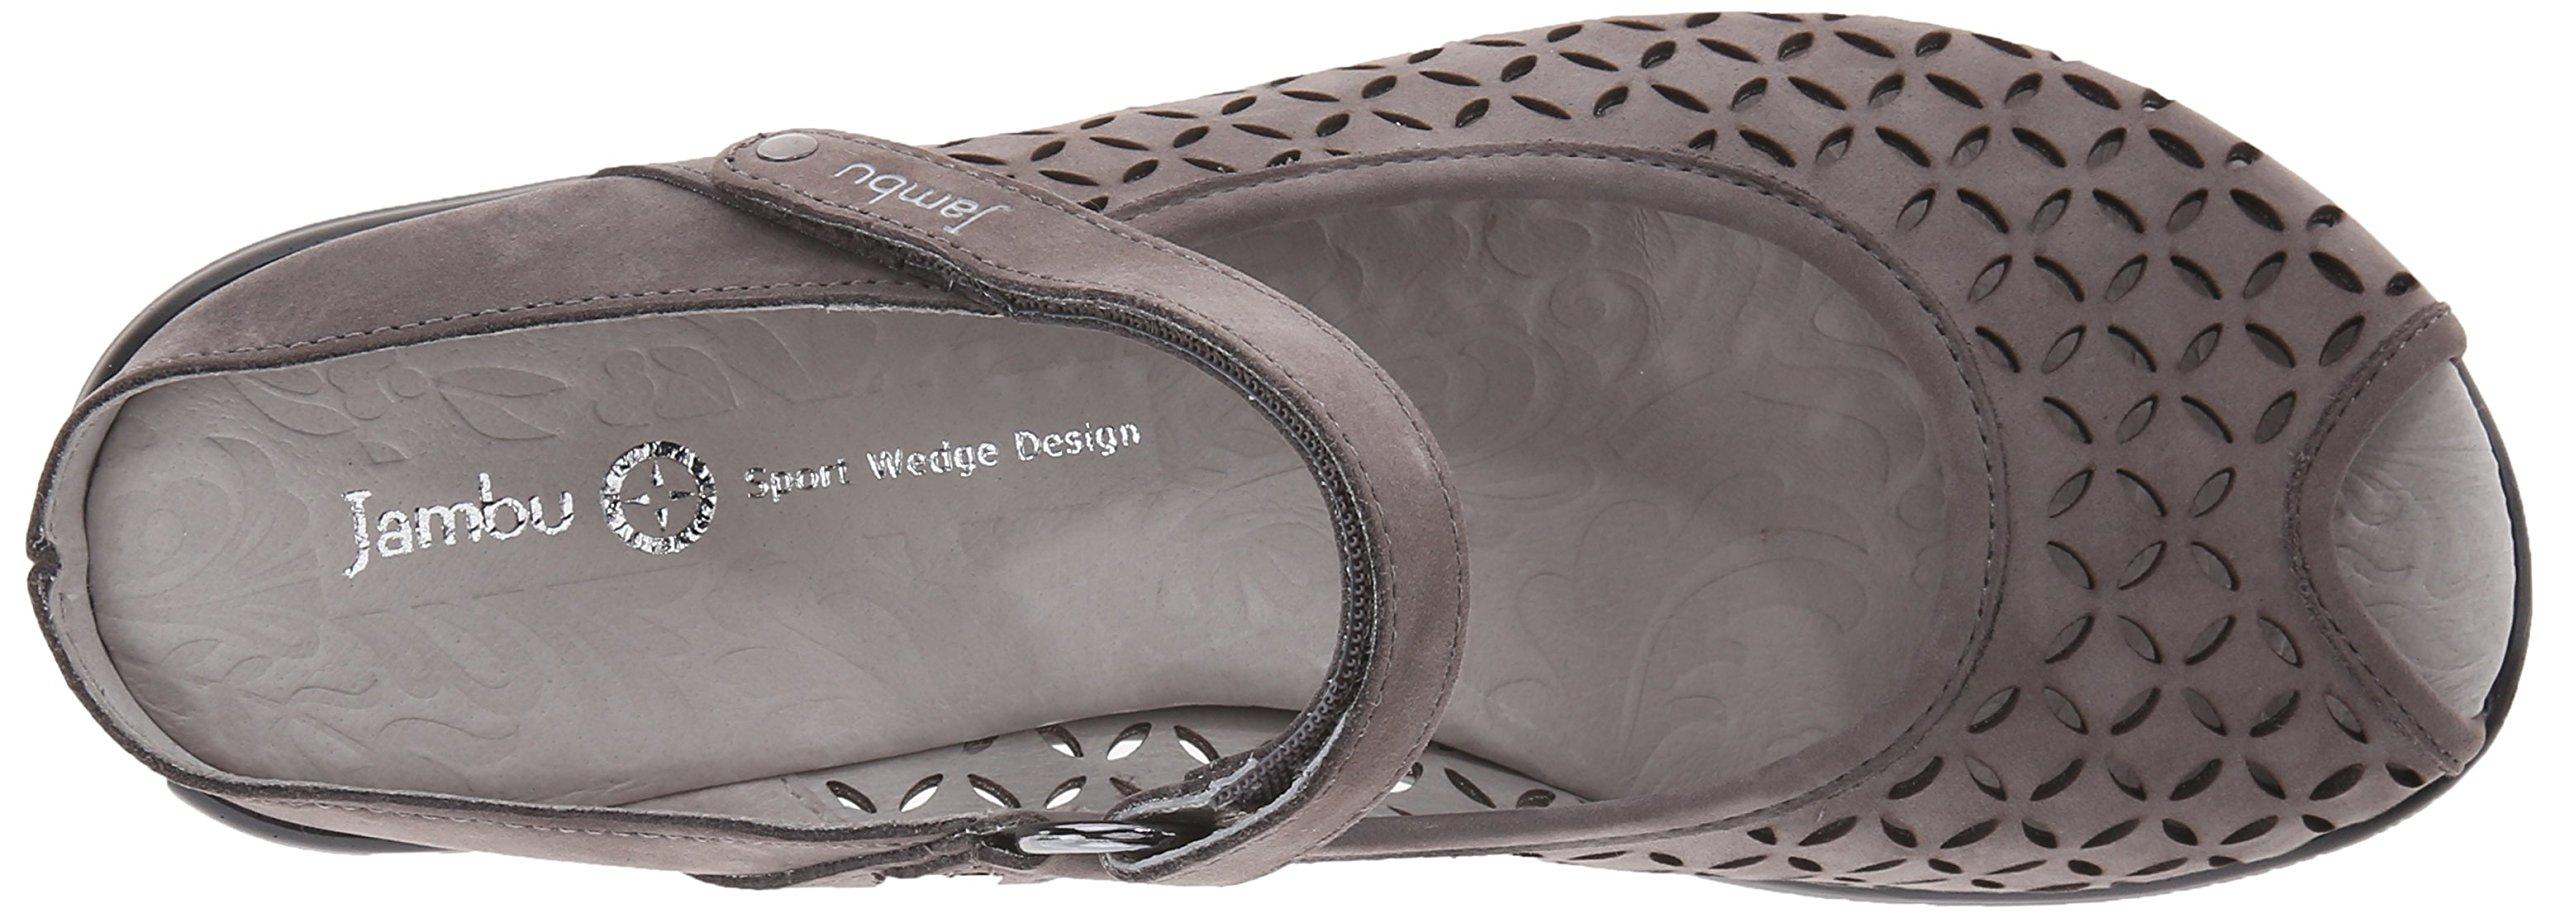 Jambu Women's Journey Encore Wedge Sandal, Dark Grey, 10 M US by Jambu (Image #8)